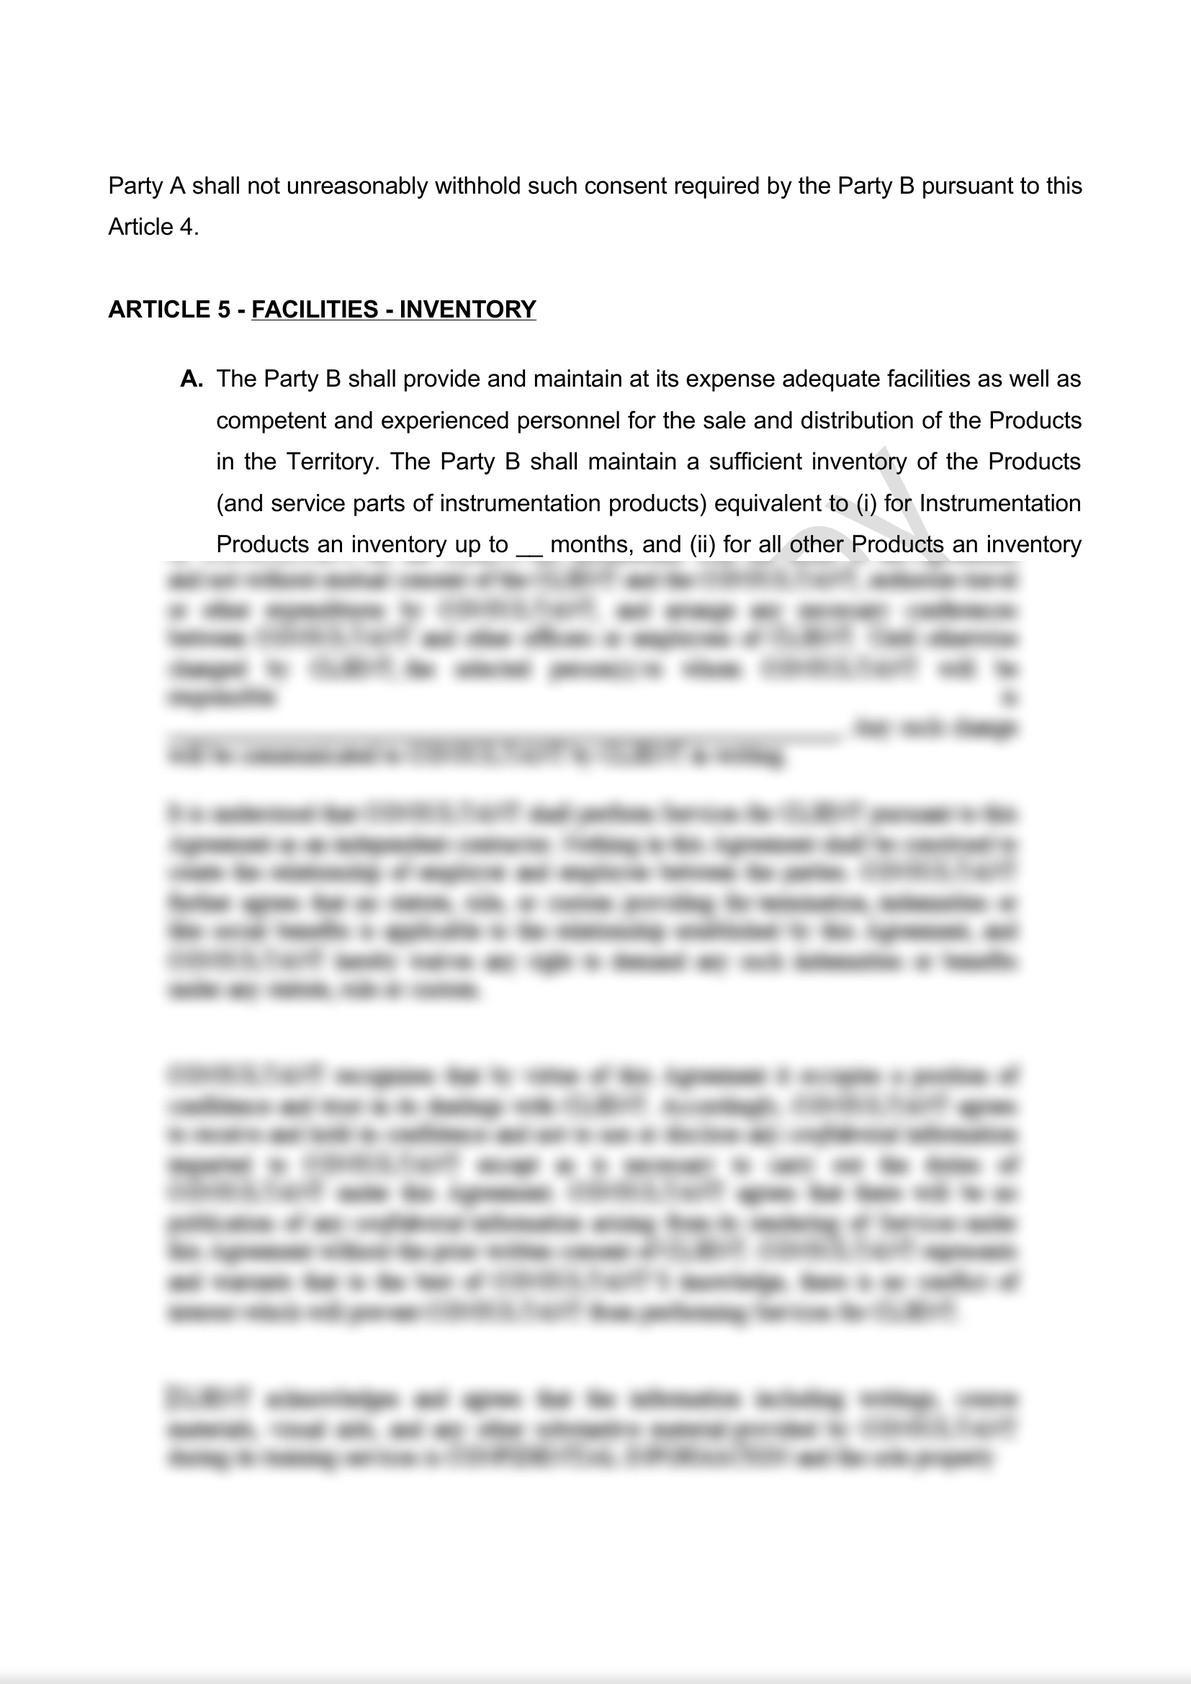 Distribution Agreement Draft (iii)-6